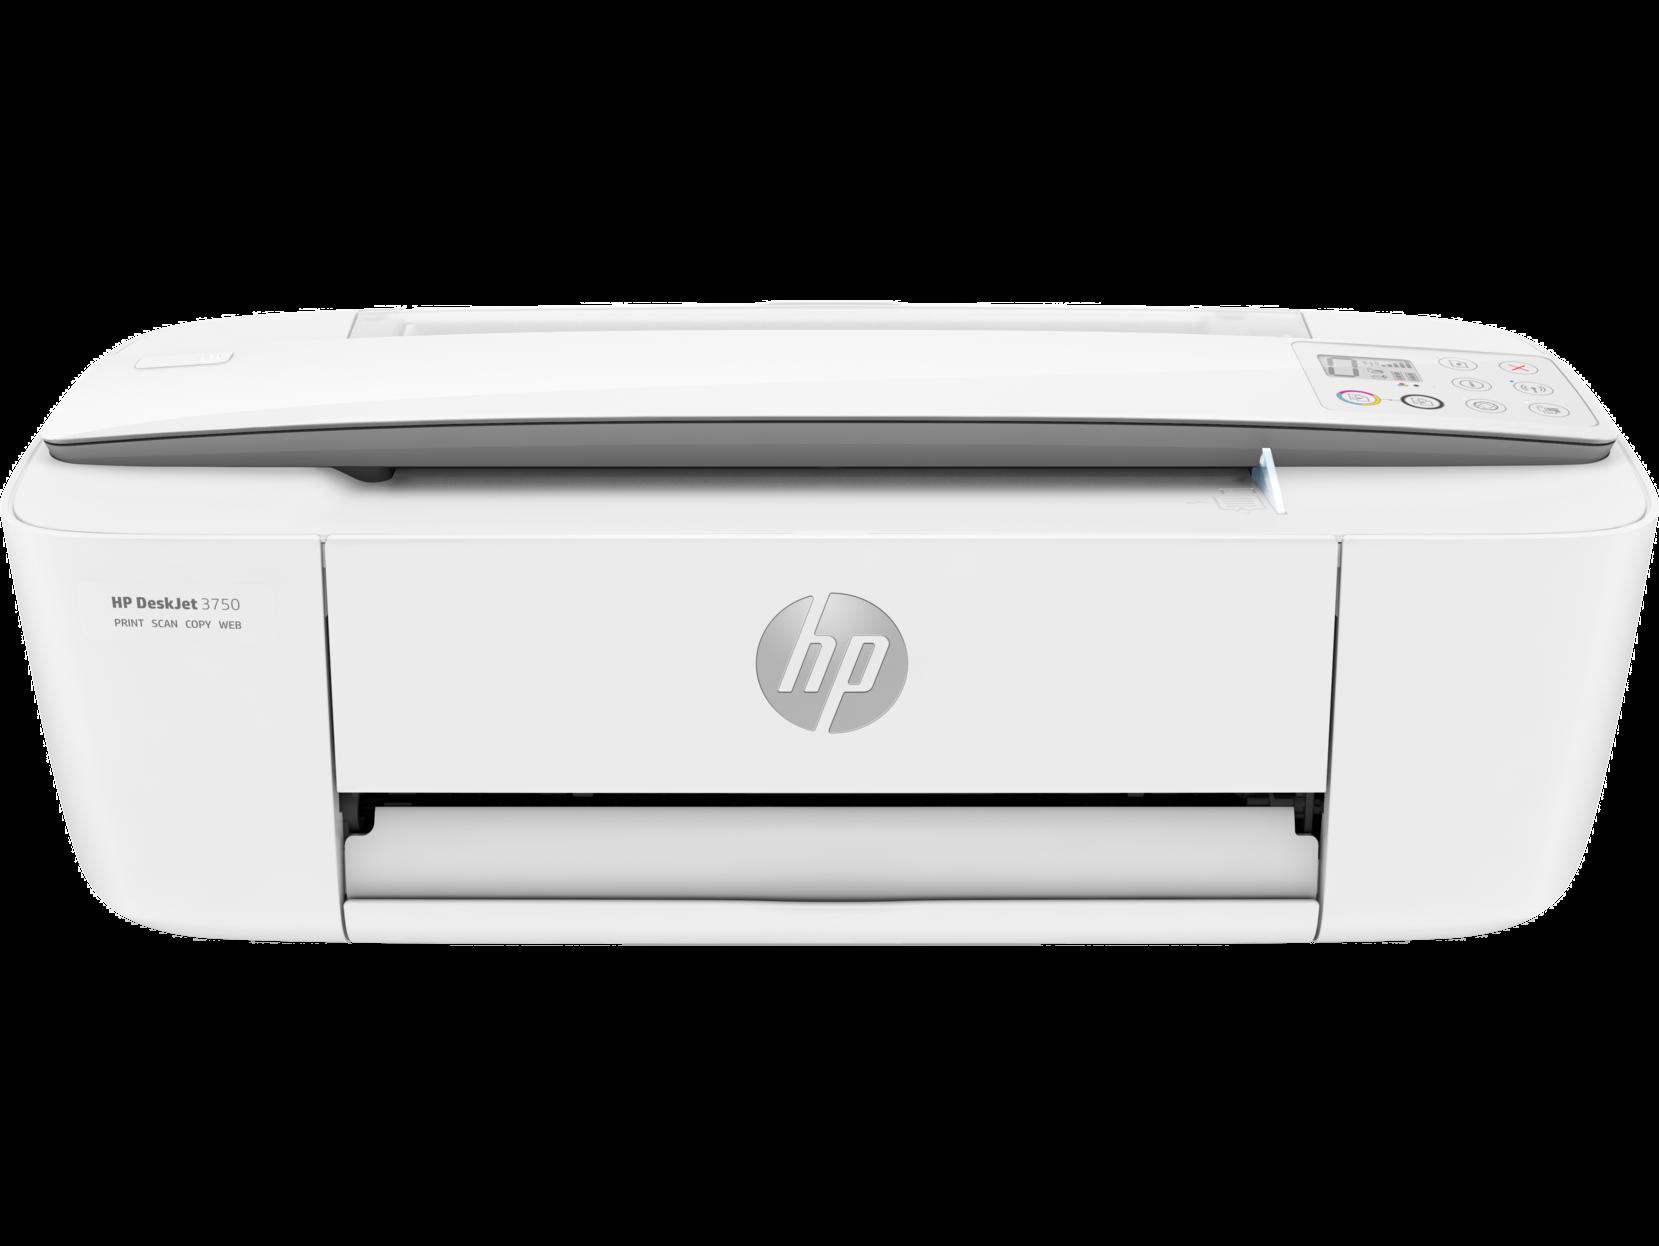 HP DeskJet 3750 All In One Printer - HP Instant Ink ready